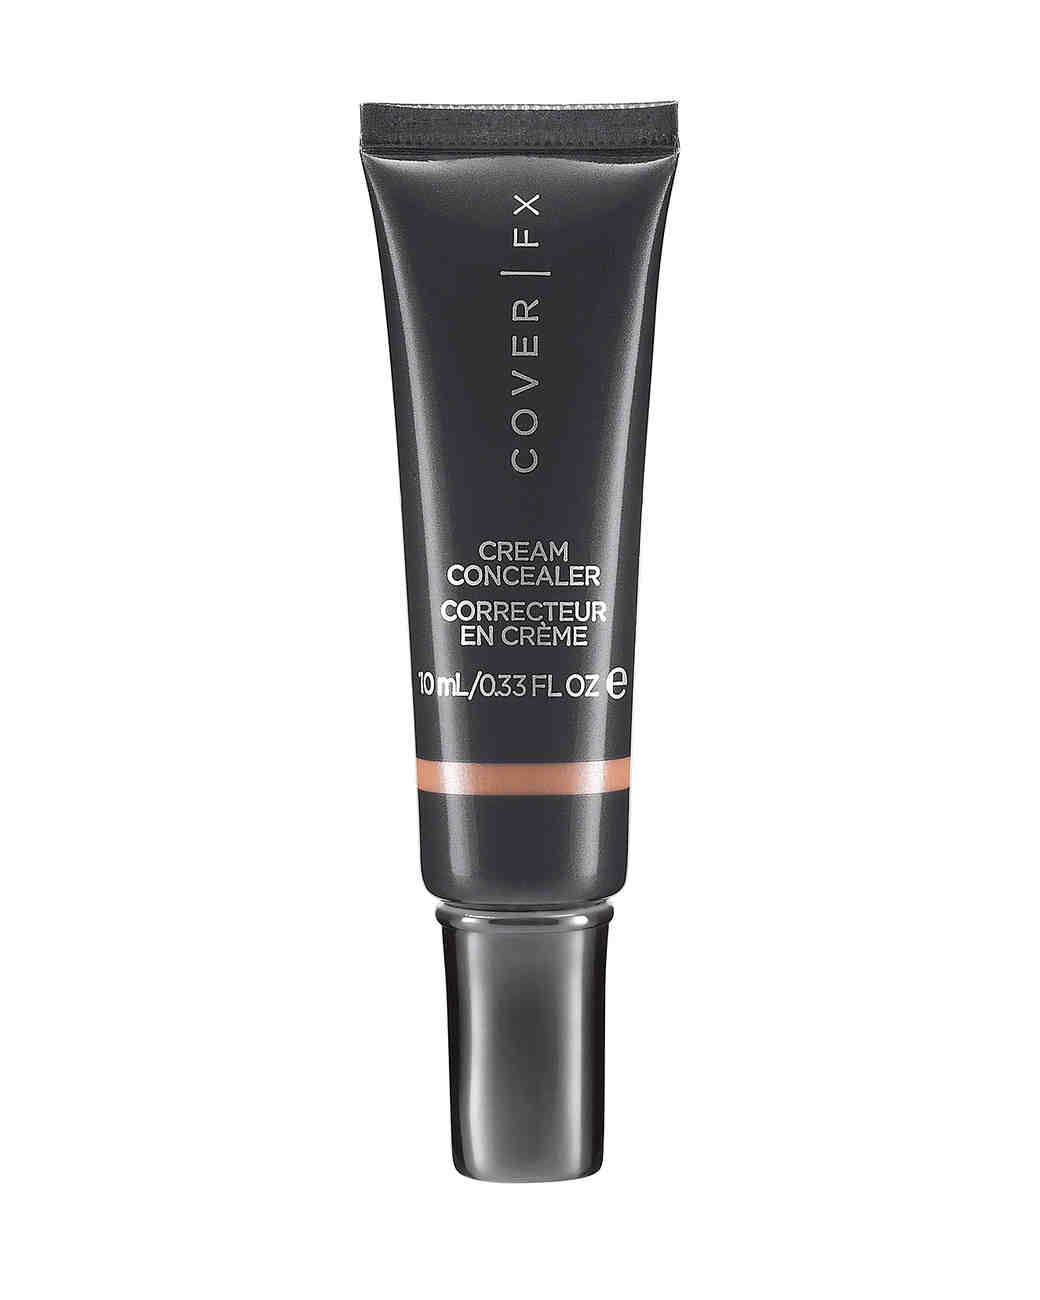 skin-glow-color-fx-cream-concealer-sephora-0815.jpg